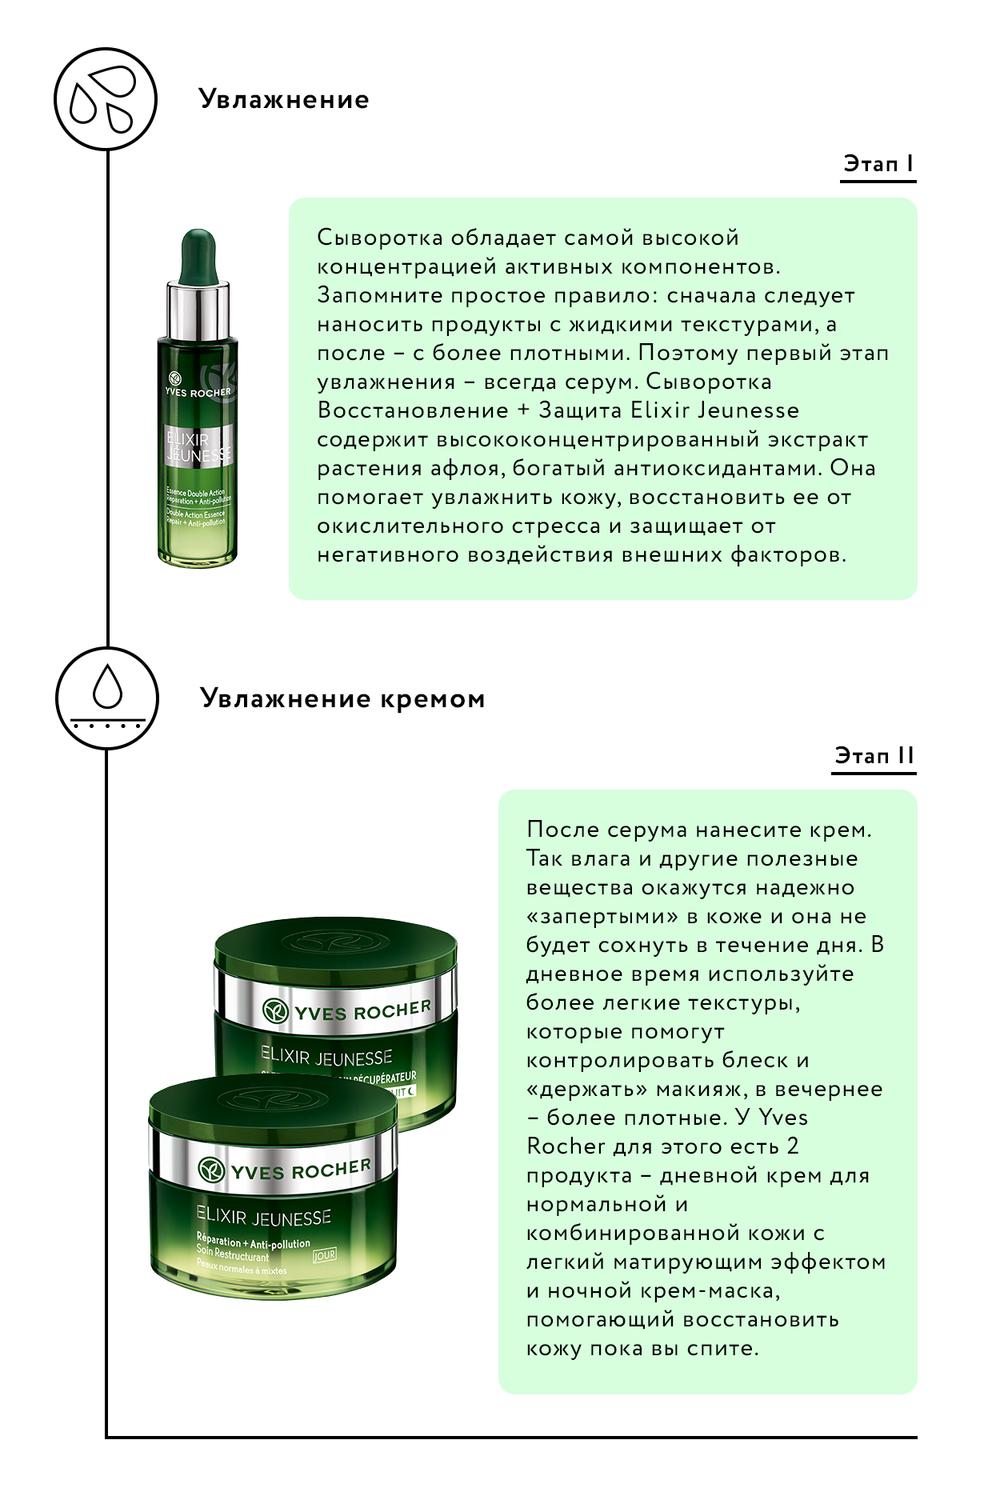 yr-infografika-2-1.png